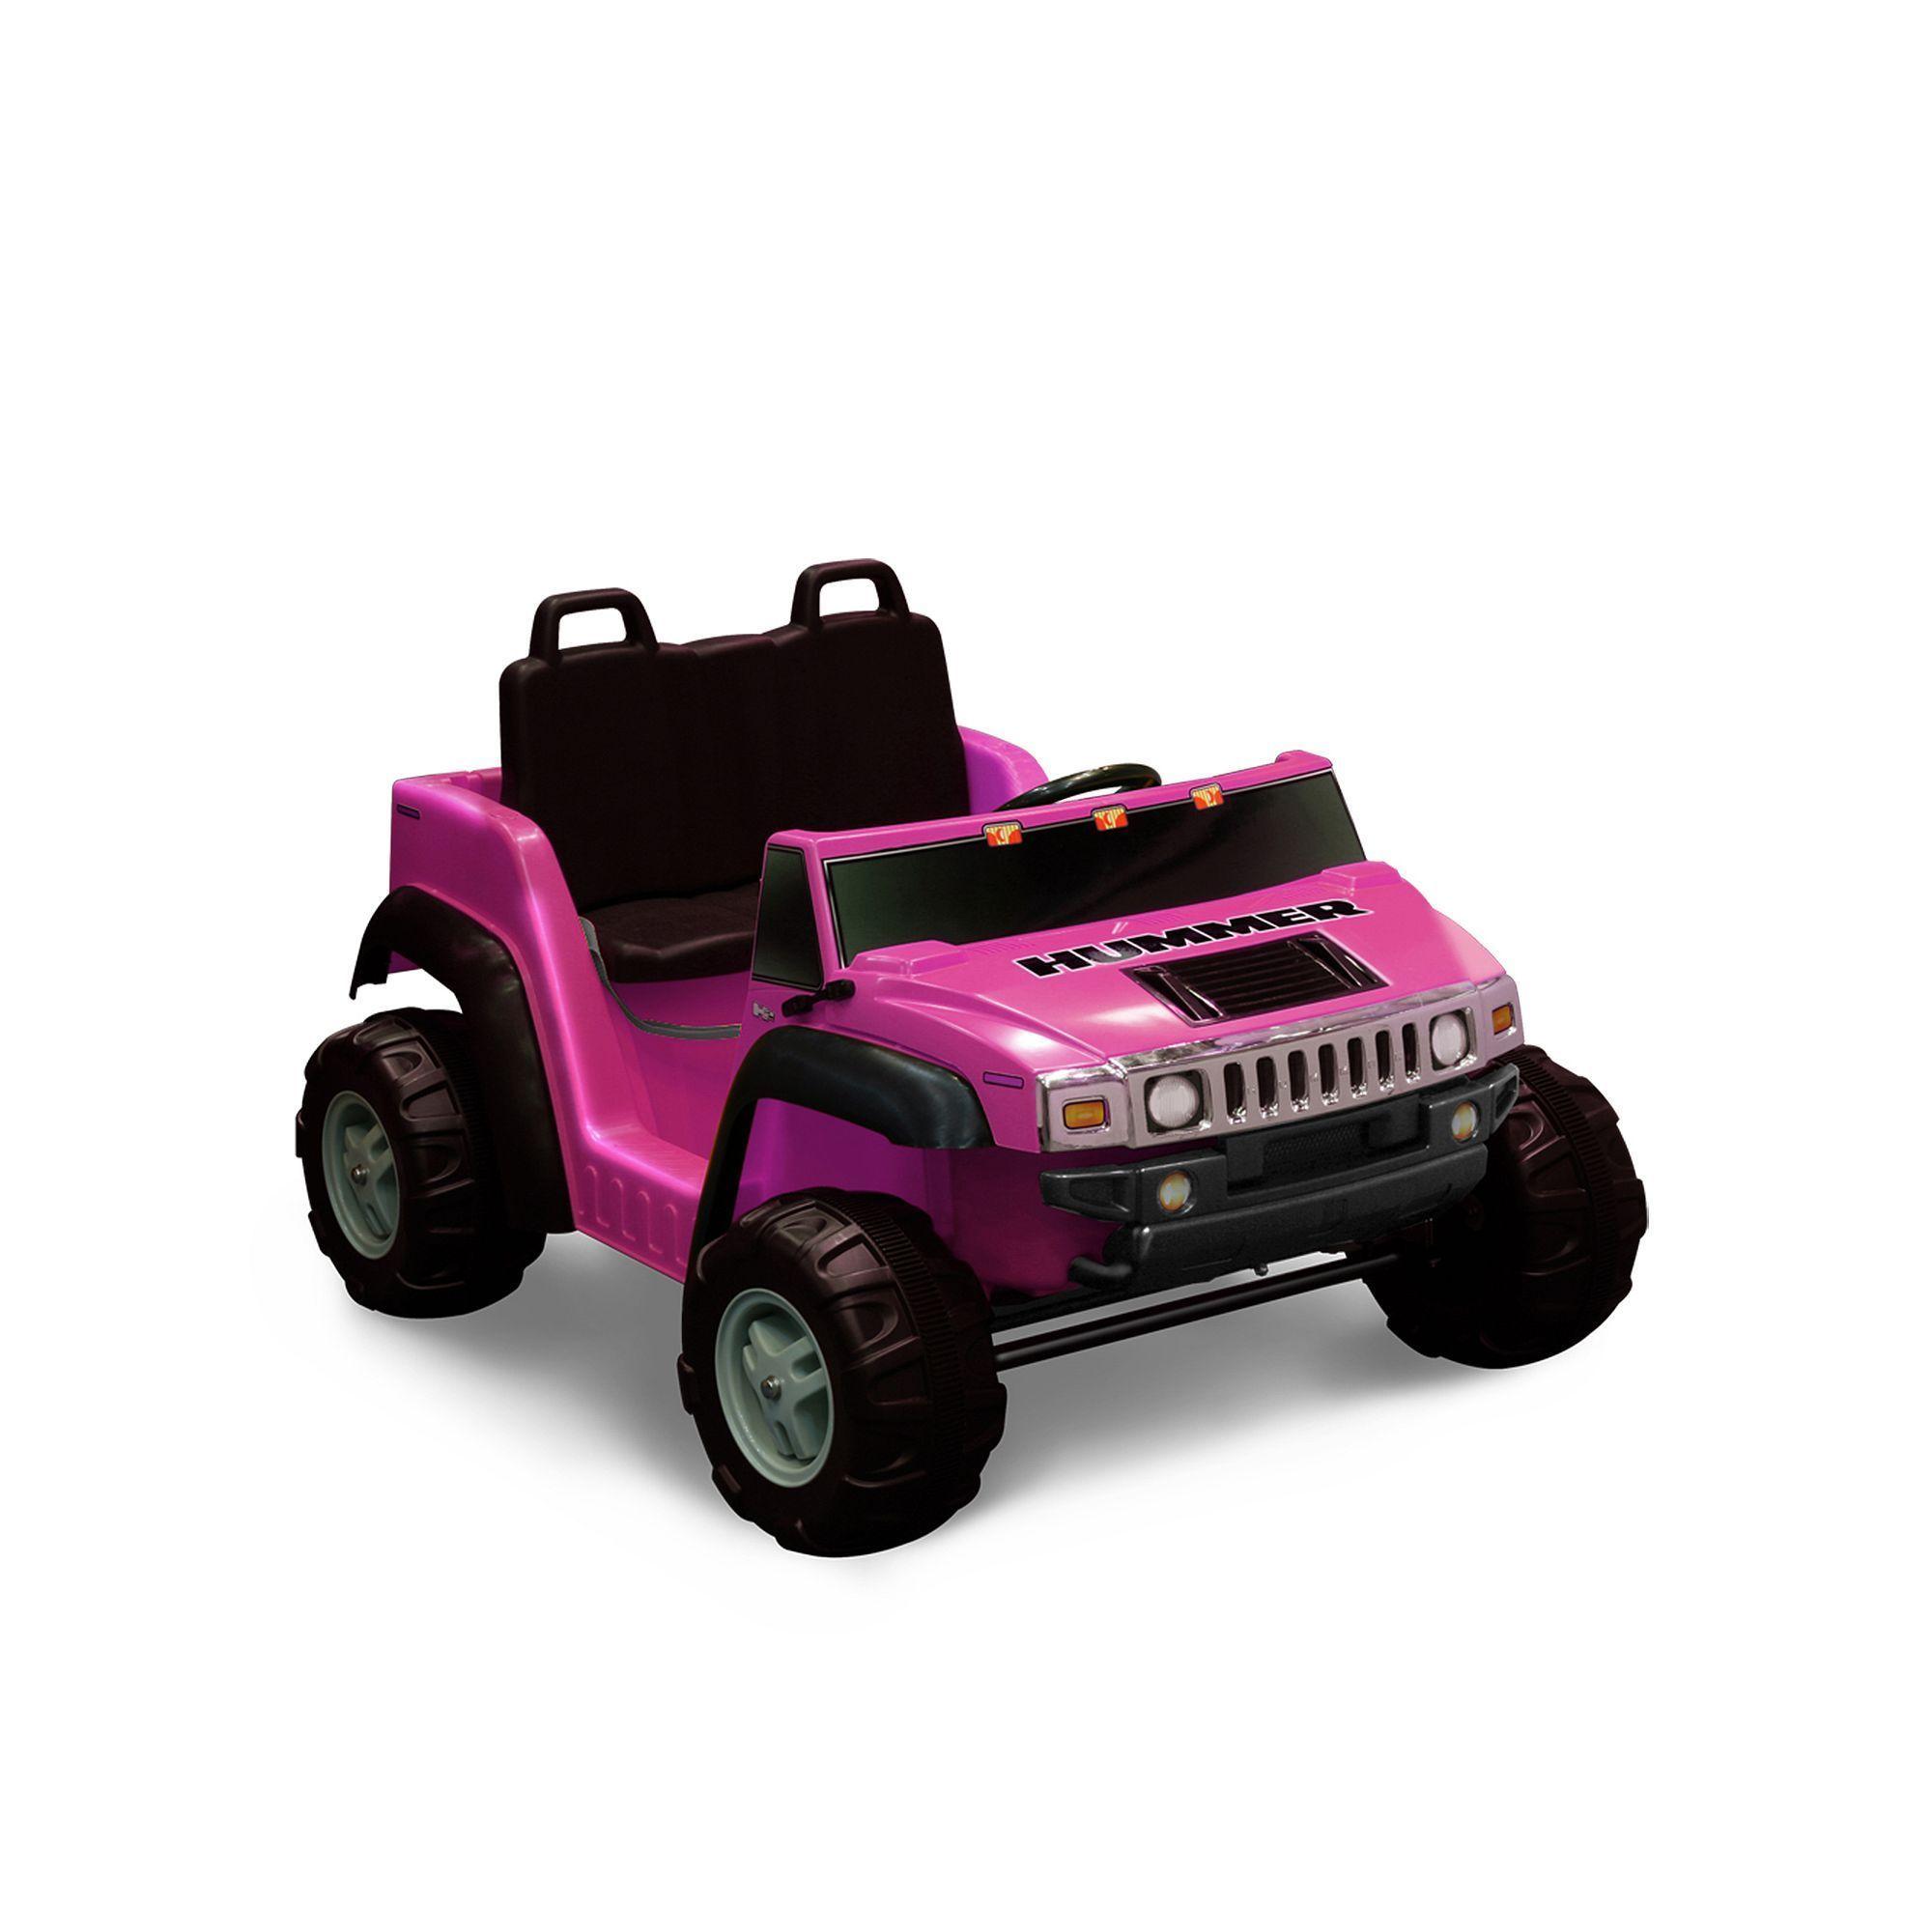 National Products 14V Hummer H14 Ride-On, Pink #rideontoys ...   12v hummer